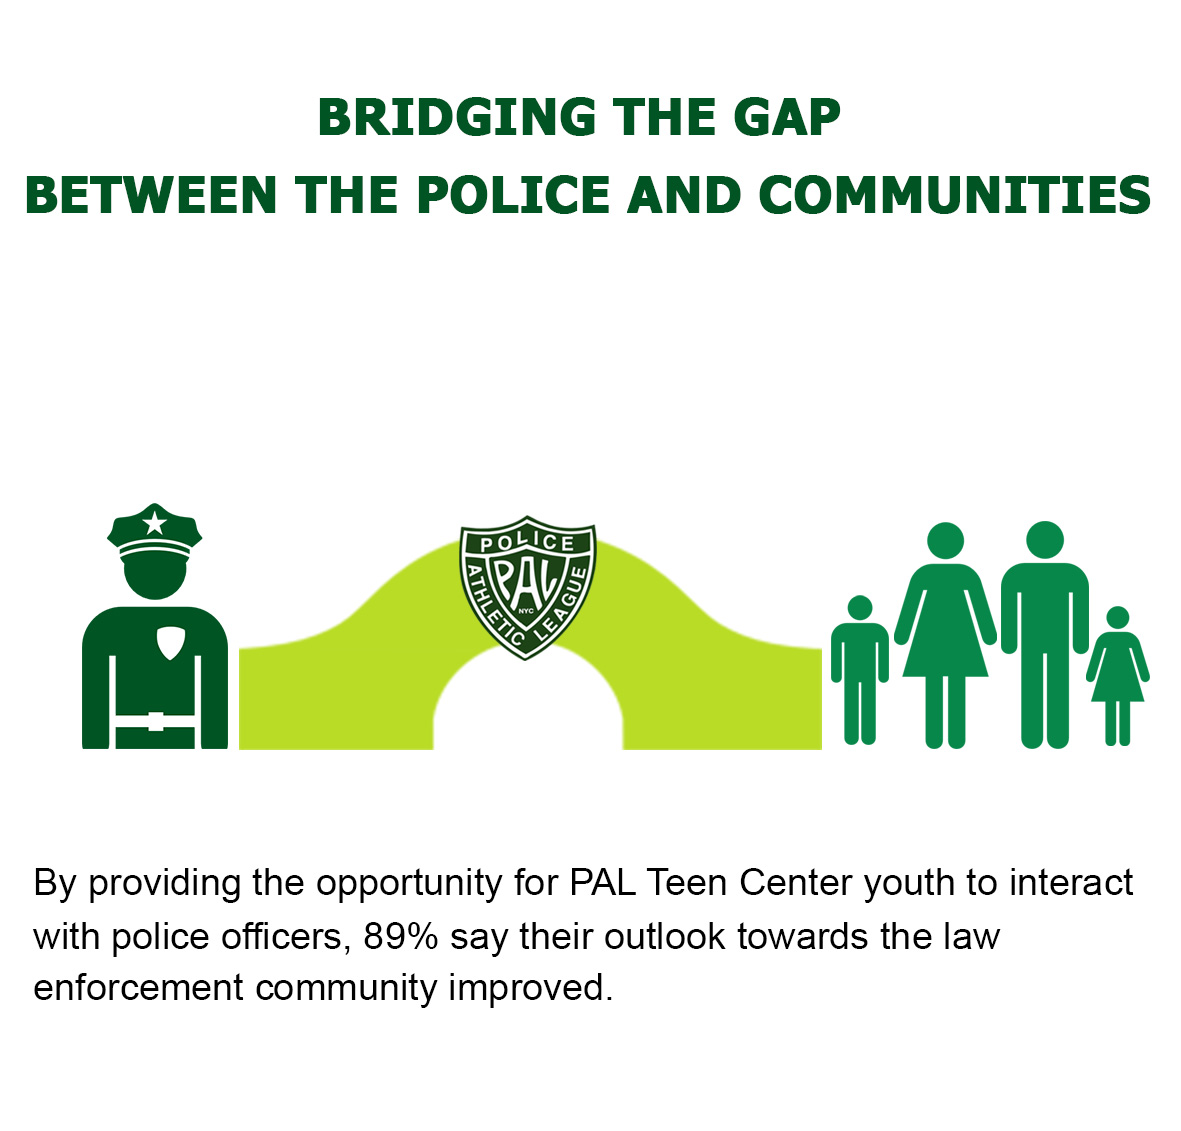 1 Bridging the Gap New Final.jpg